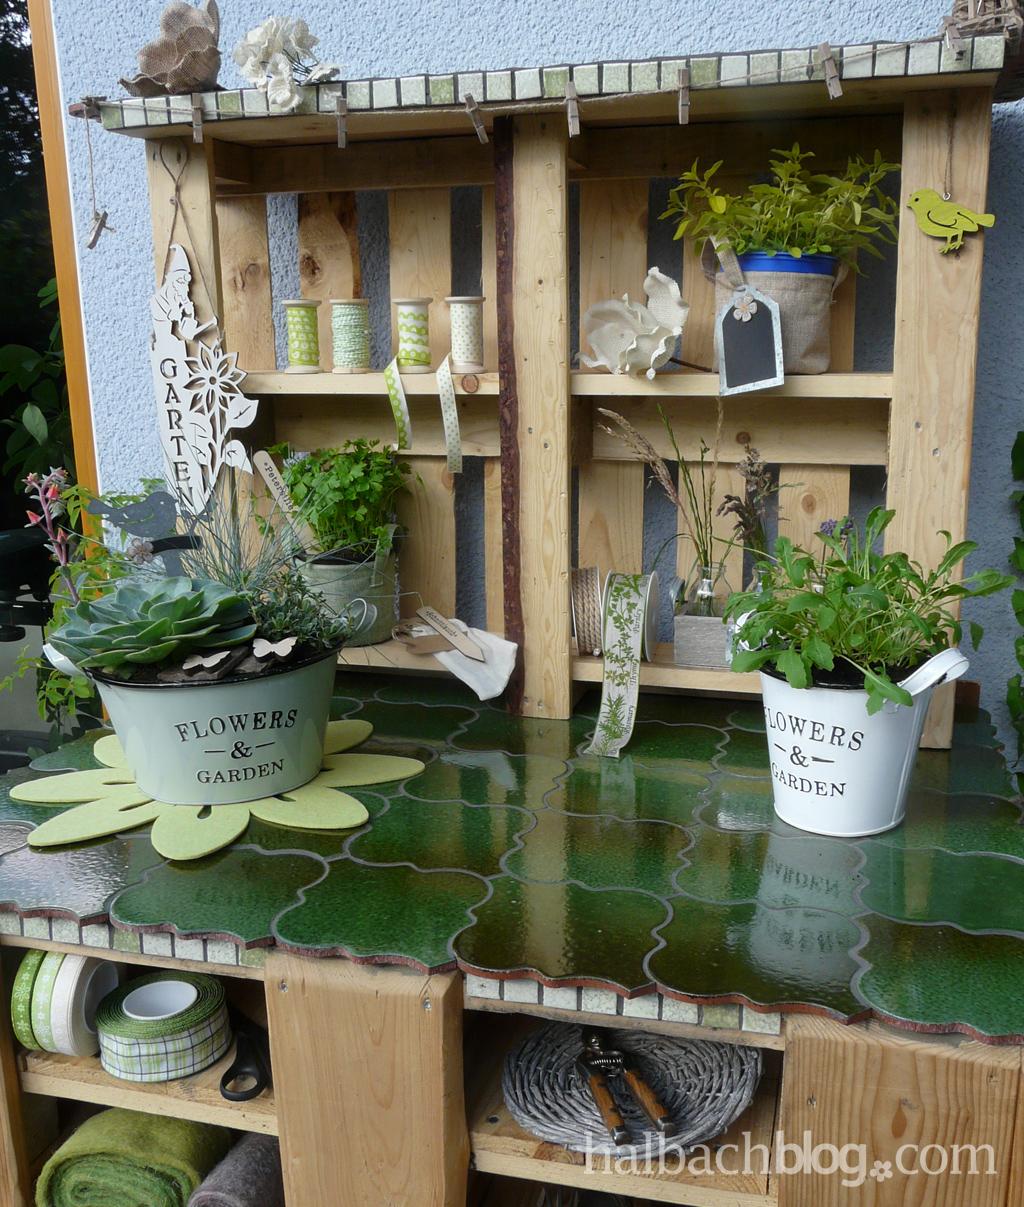 pflanztisch aus paletten, upcycling: palettenbau - halbachblog, Design ideen